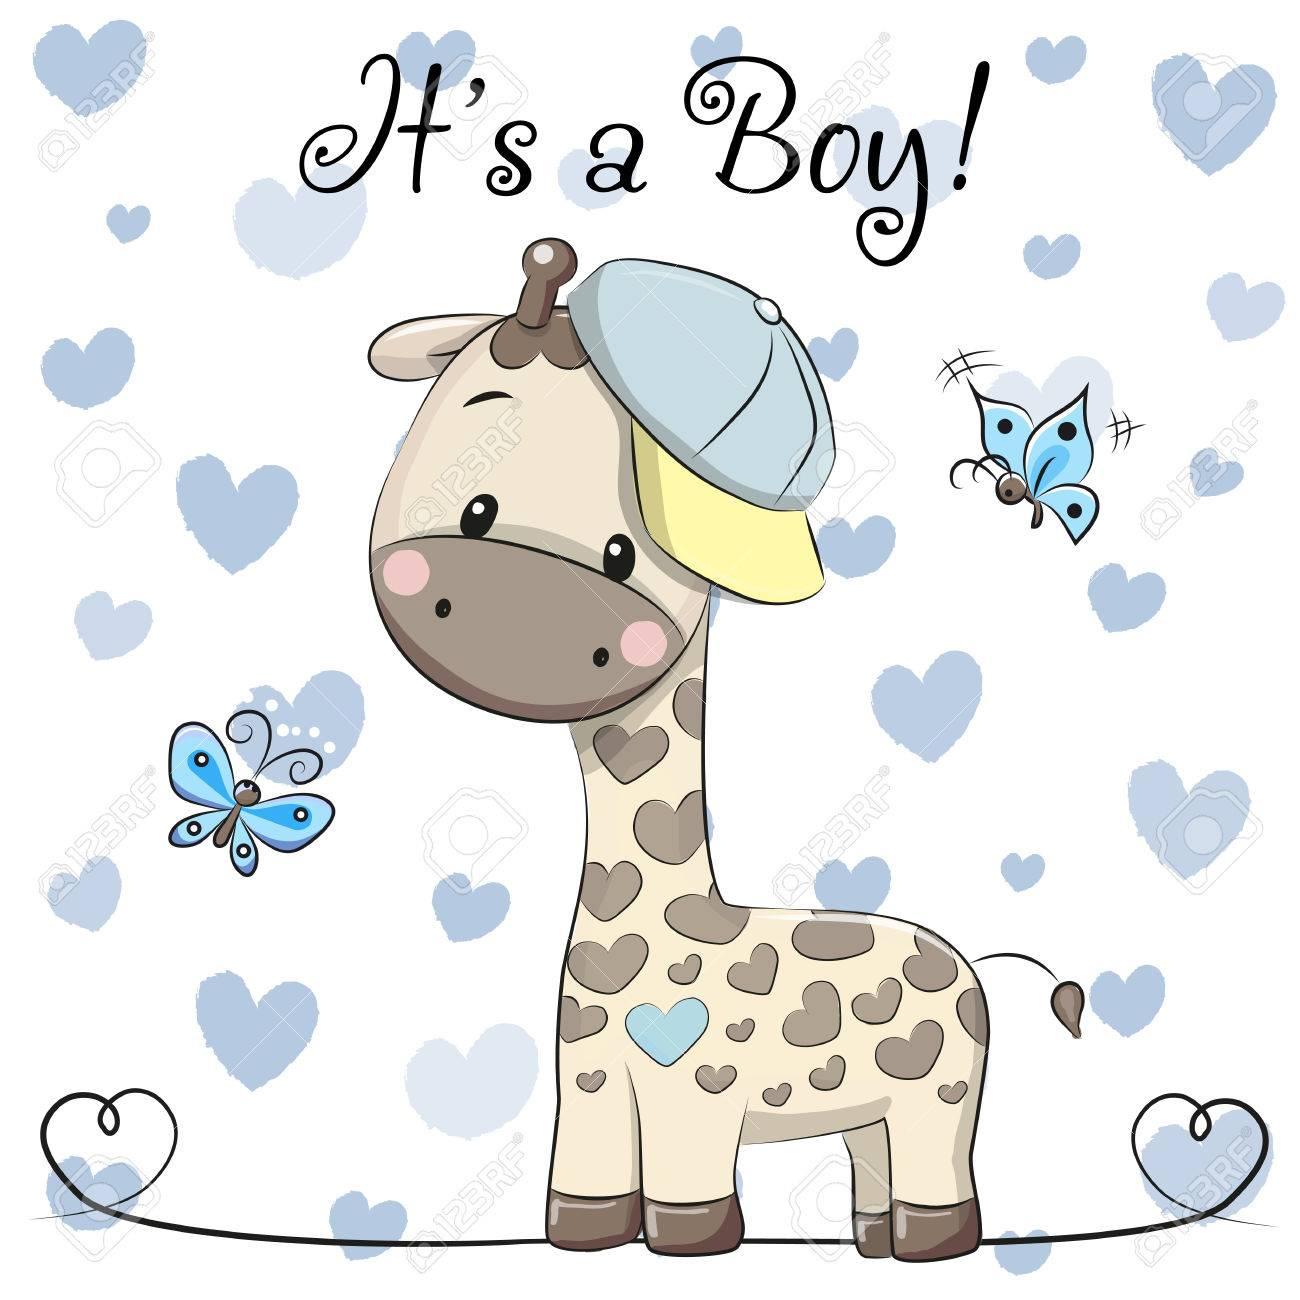 Baby Shower Greeting Card with cute Cartoon Giraffe boy - 85057932